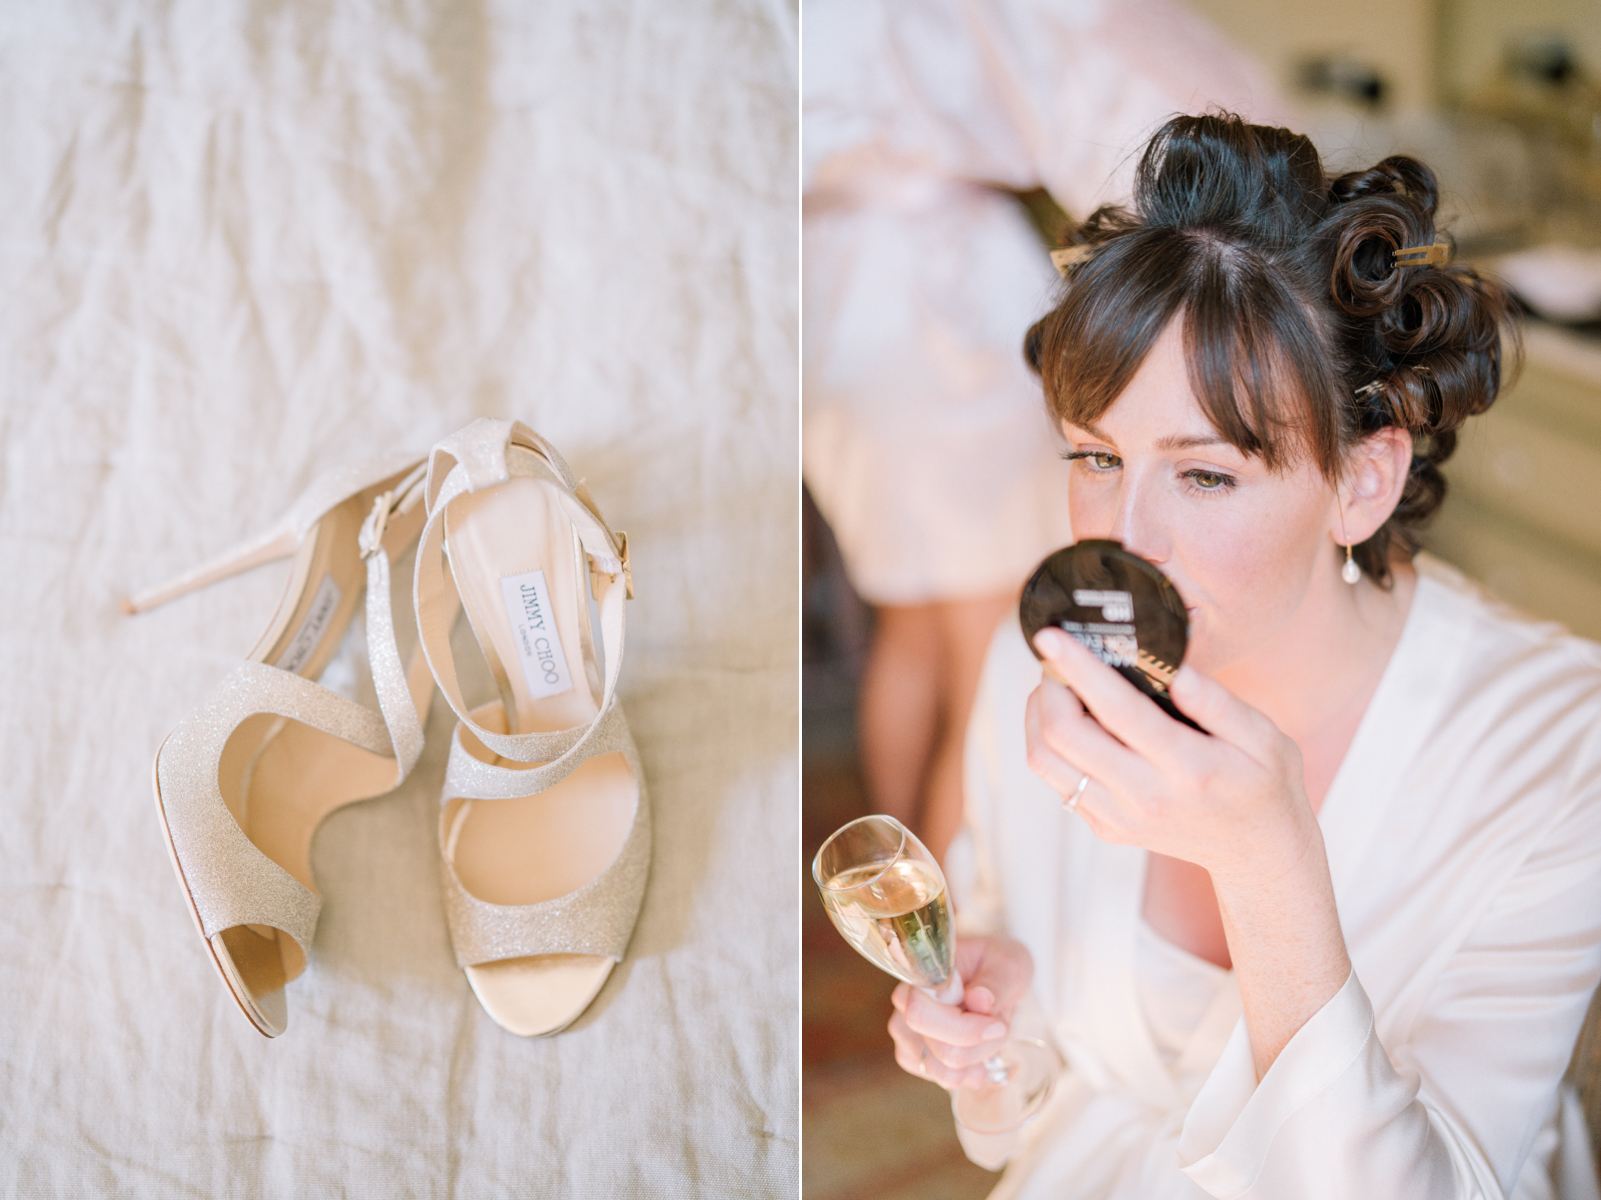 Boheme-Moon-Photography-Wedding-in-Provence-France_003.jpg